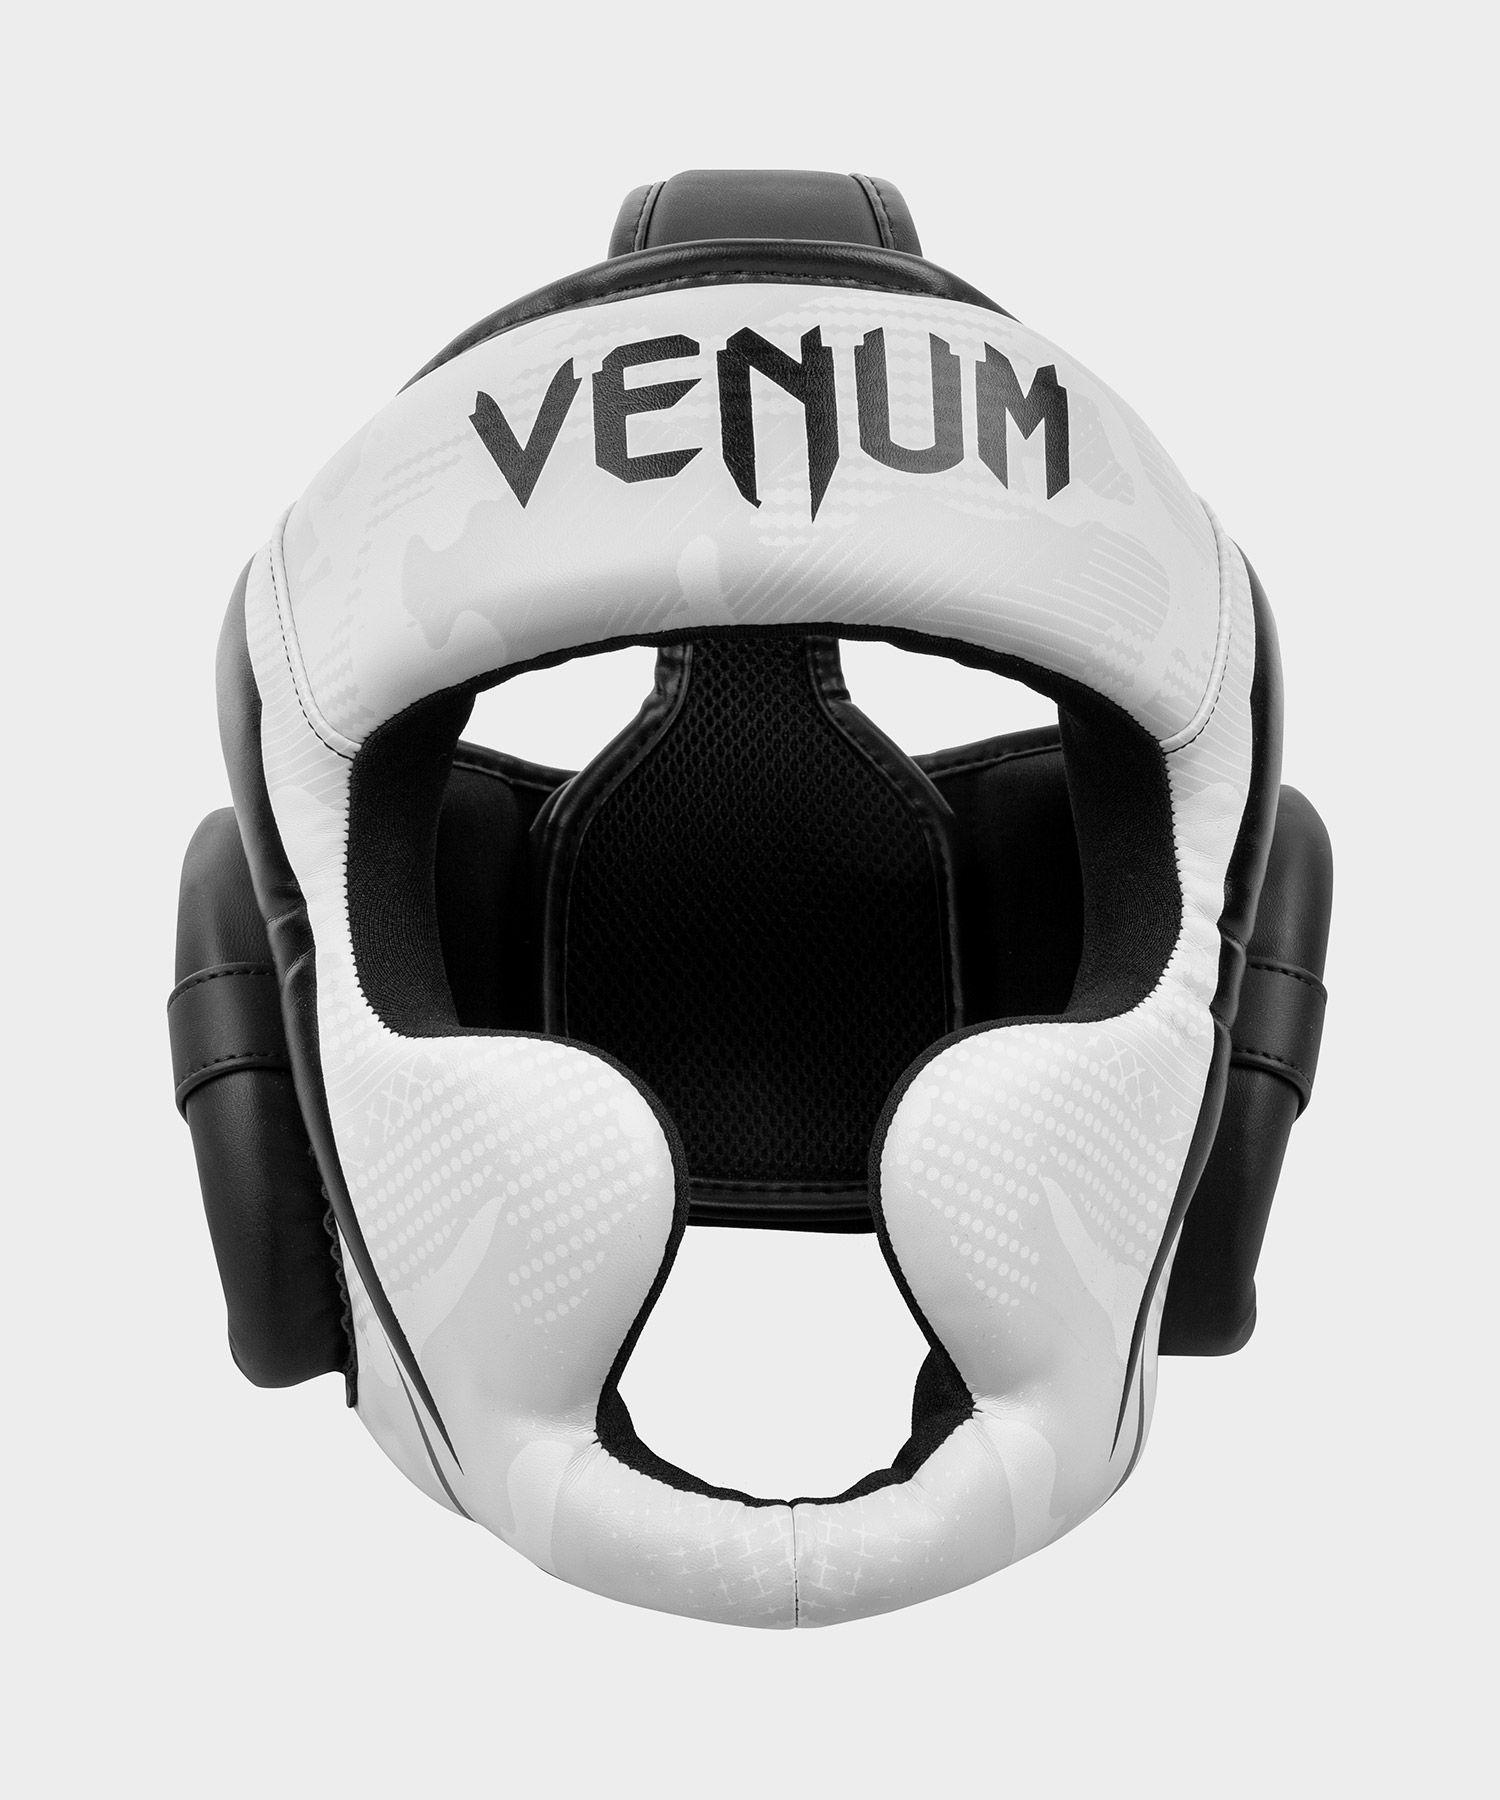 Venum Elite Bokshelm - Wit/Camouflage